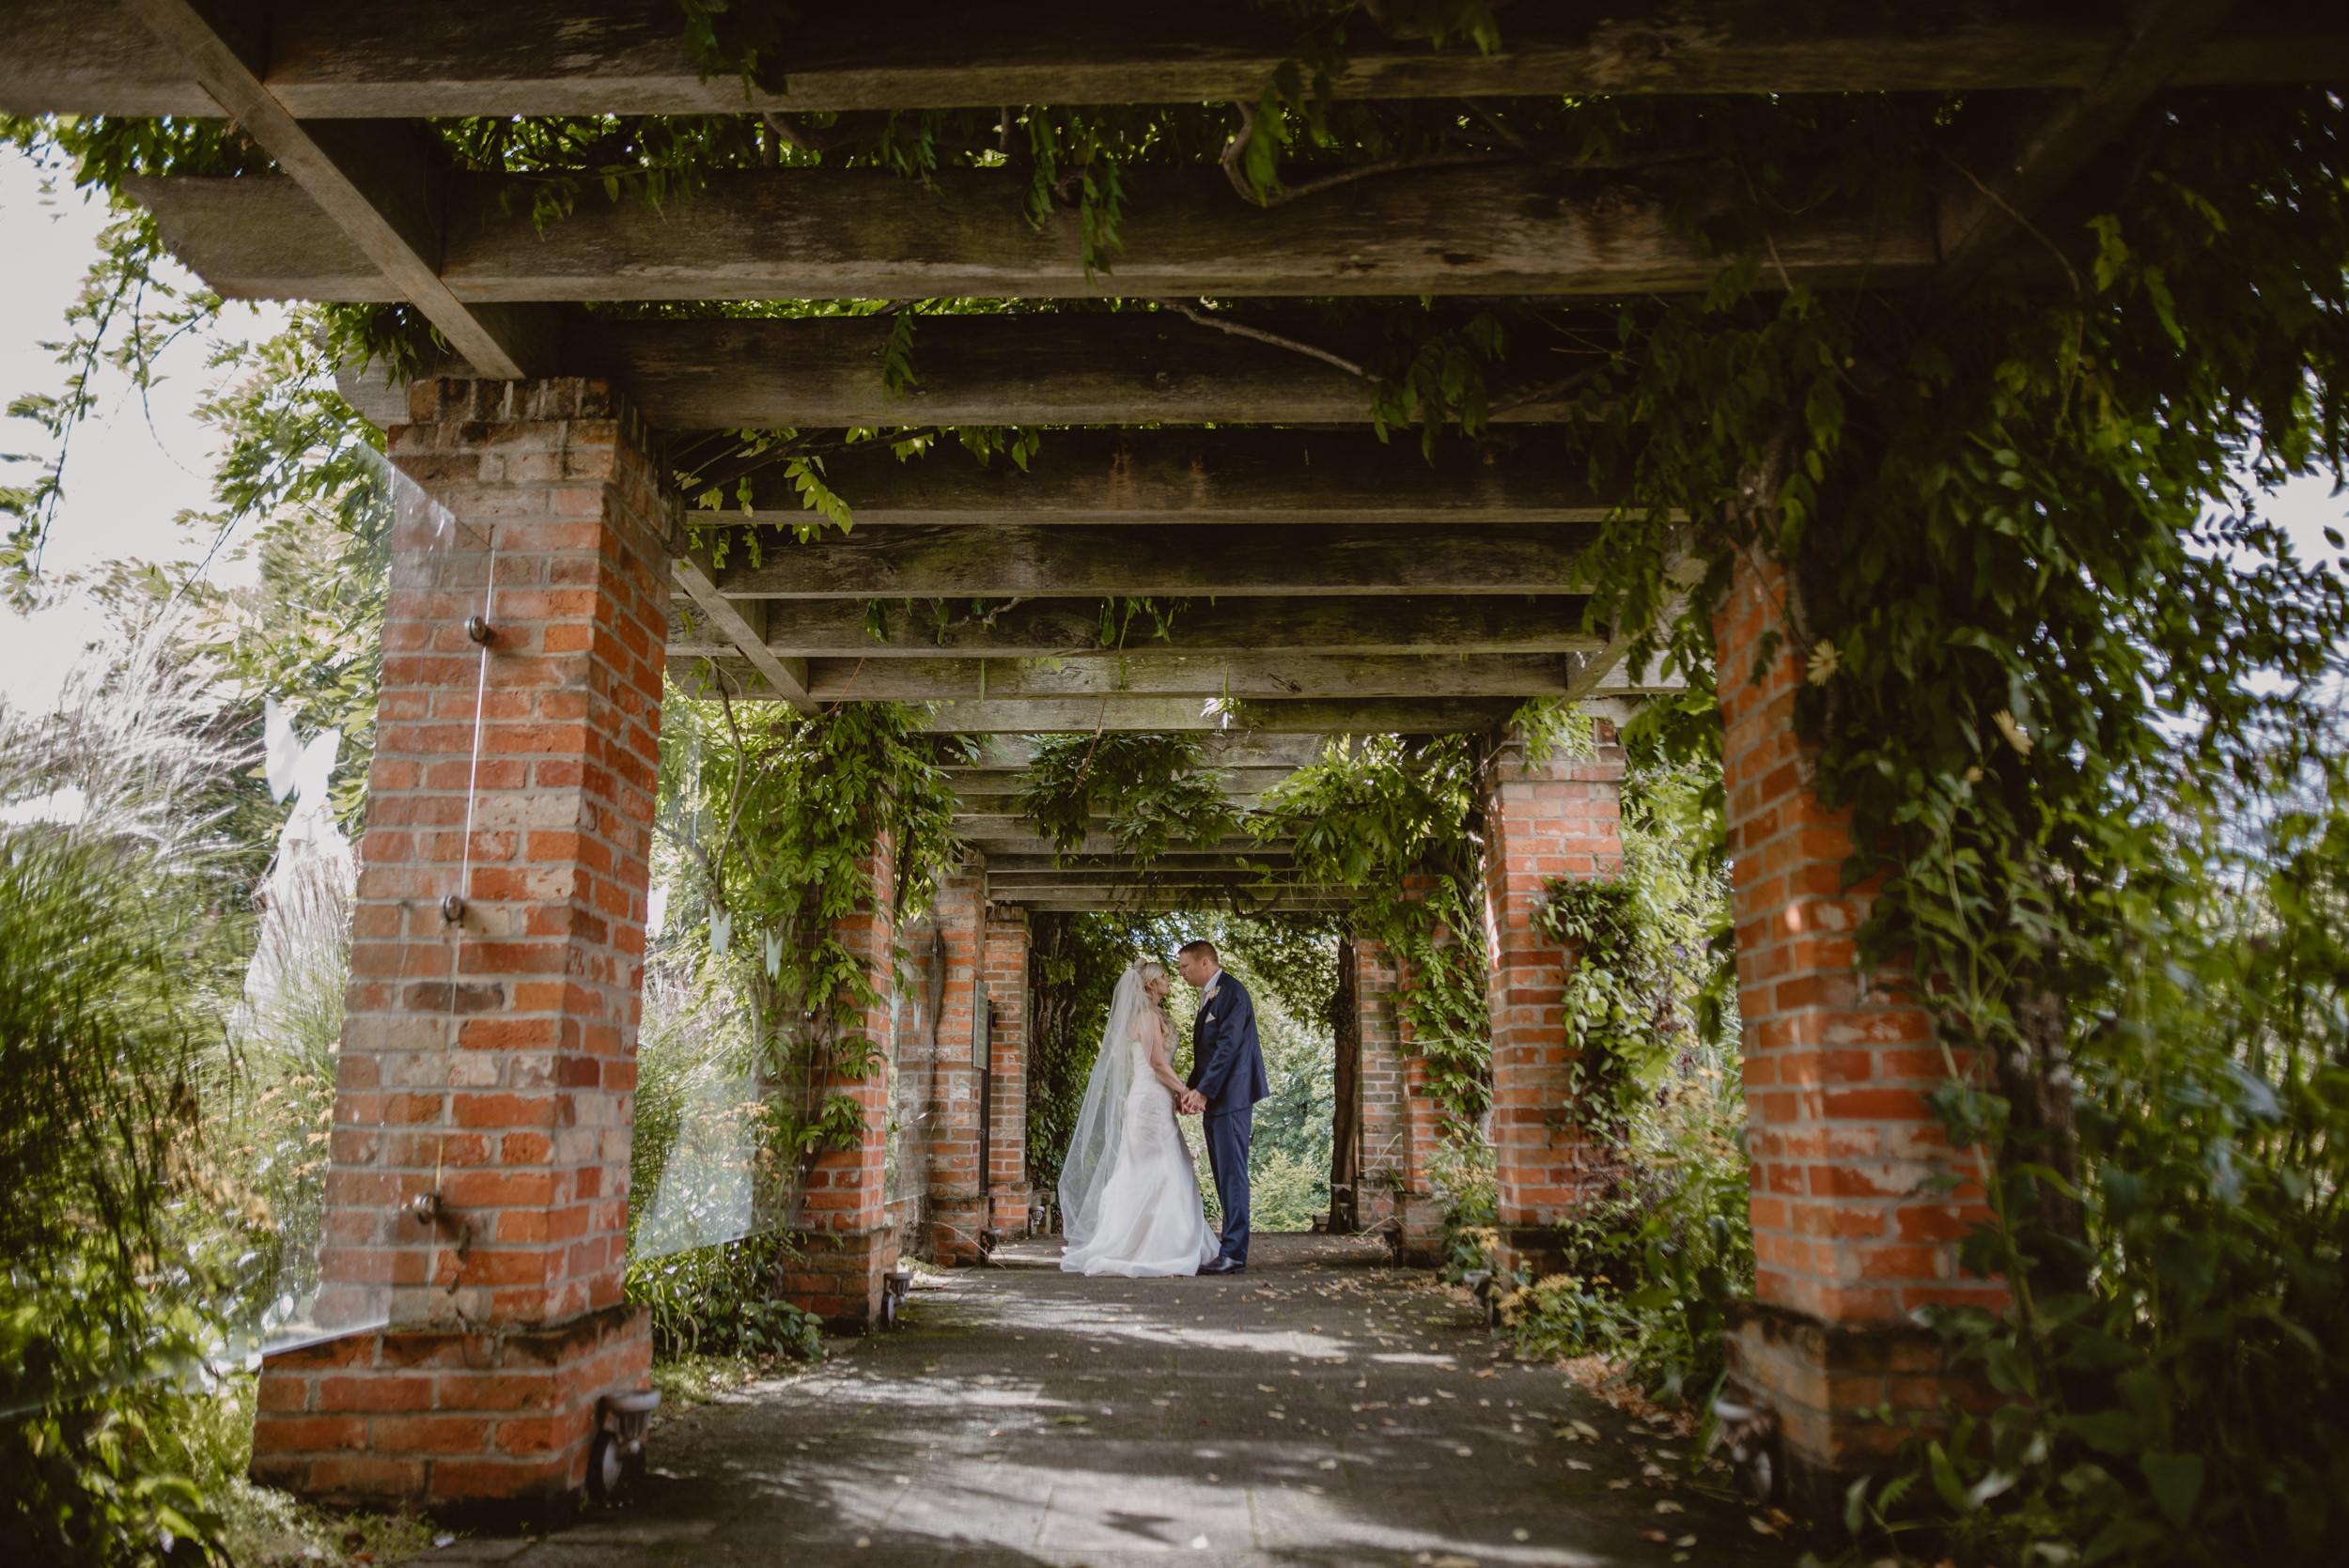 Trisha-and-Roger-wedding-The-Priory-Church-and-Chewton-Glen-Hotel-Christchurch-Manu-Mendoza-Wedding-Photography-318.jpg